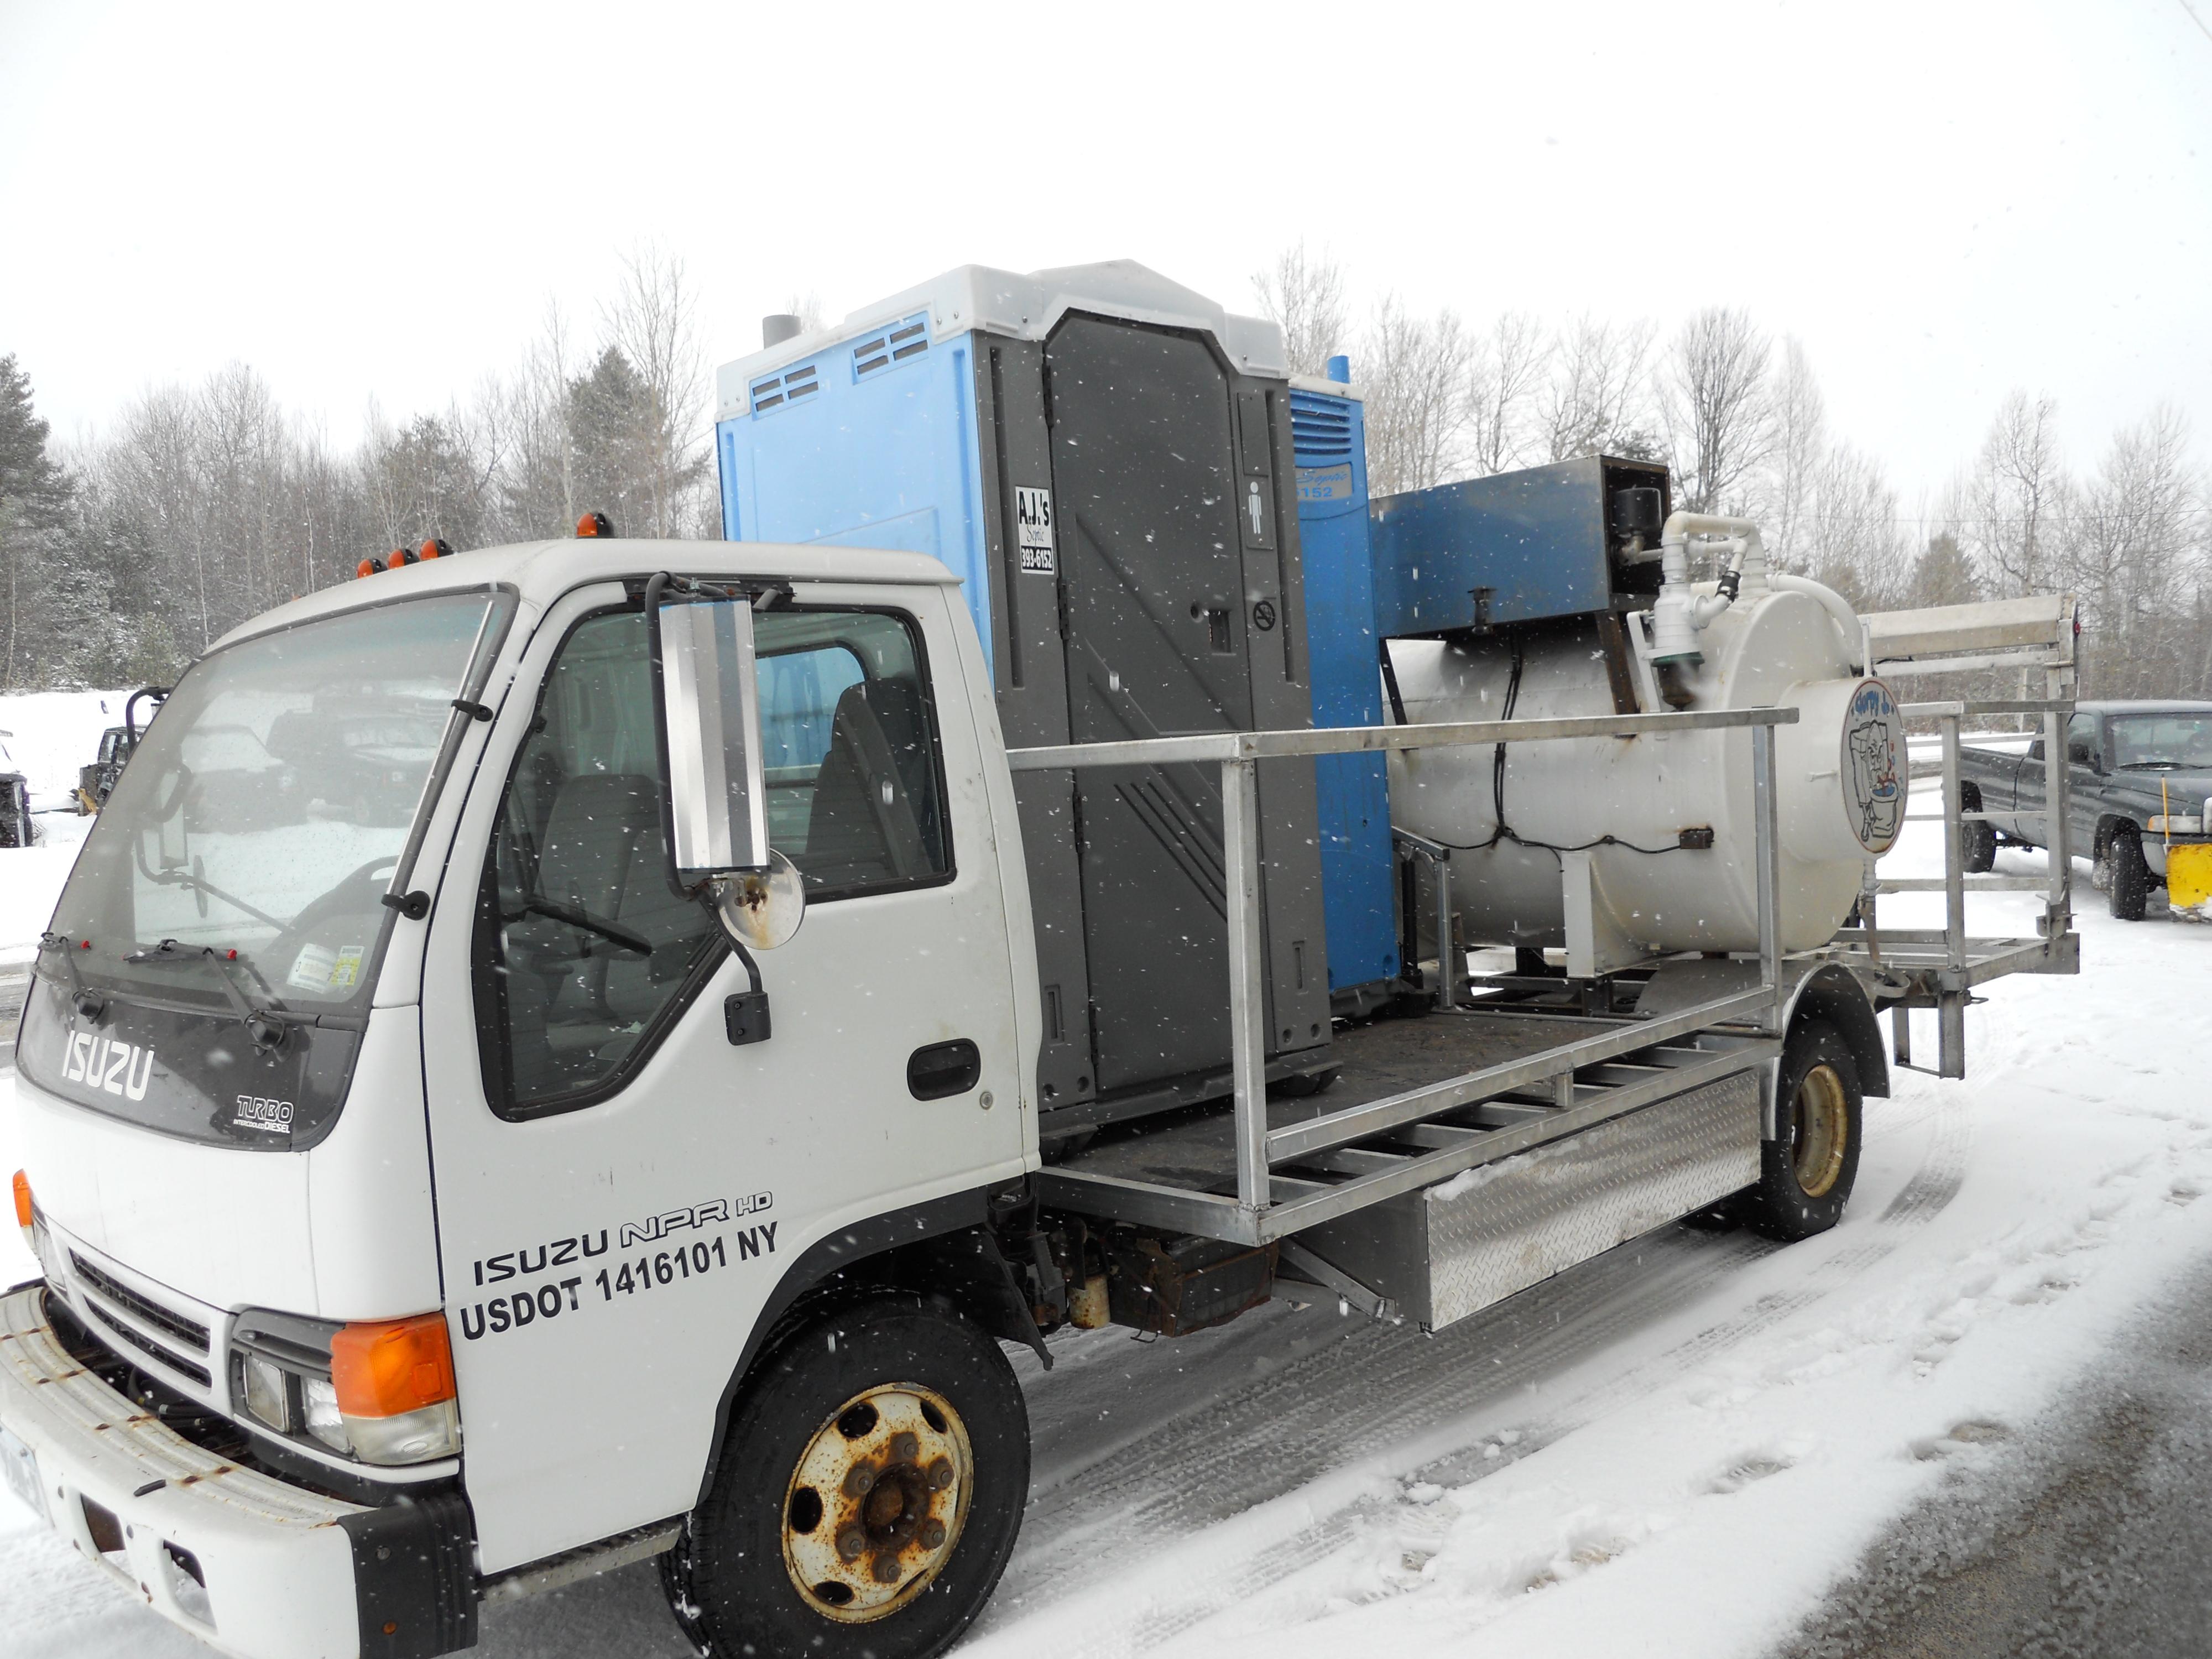 AJ's Septic isuzu portable toilet service truck